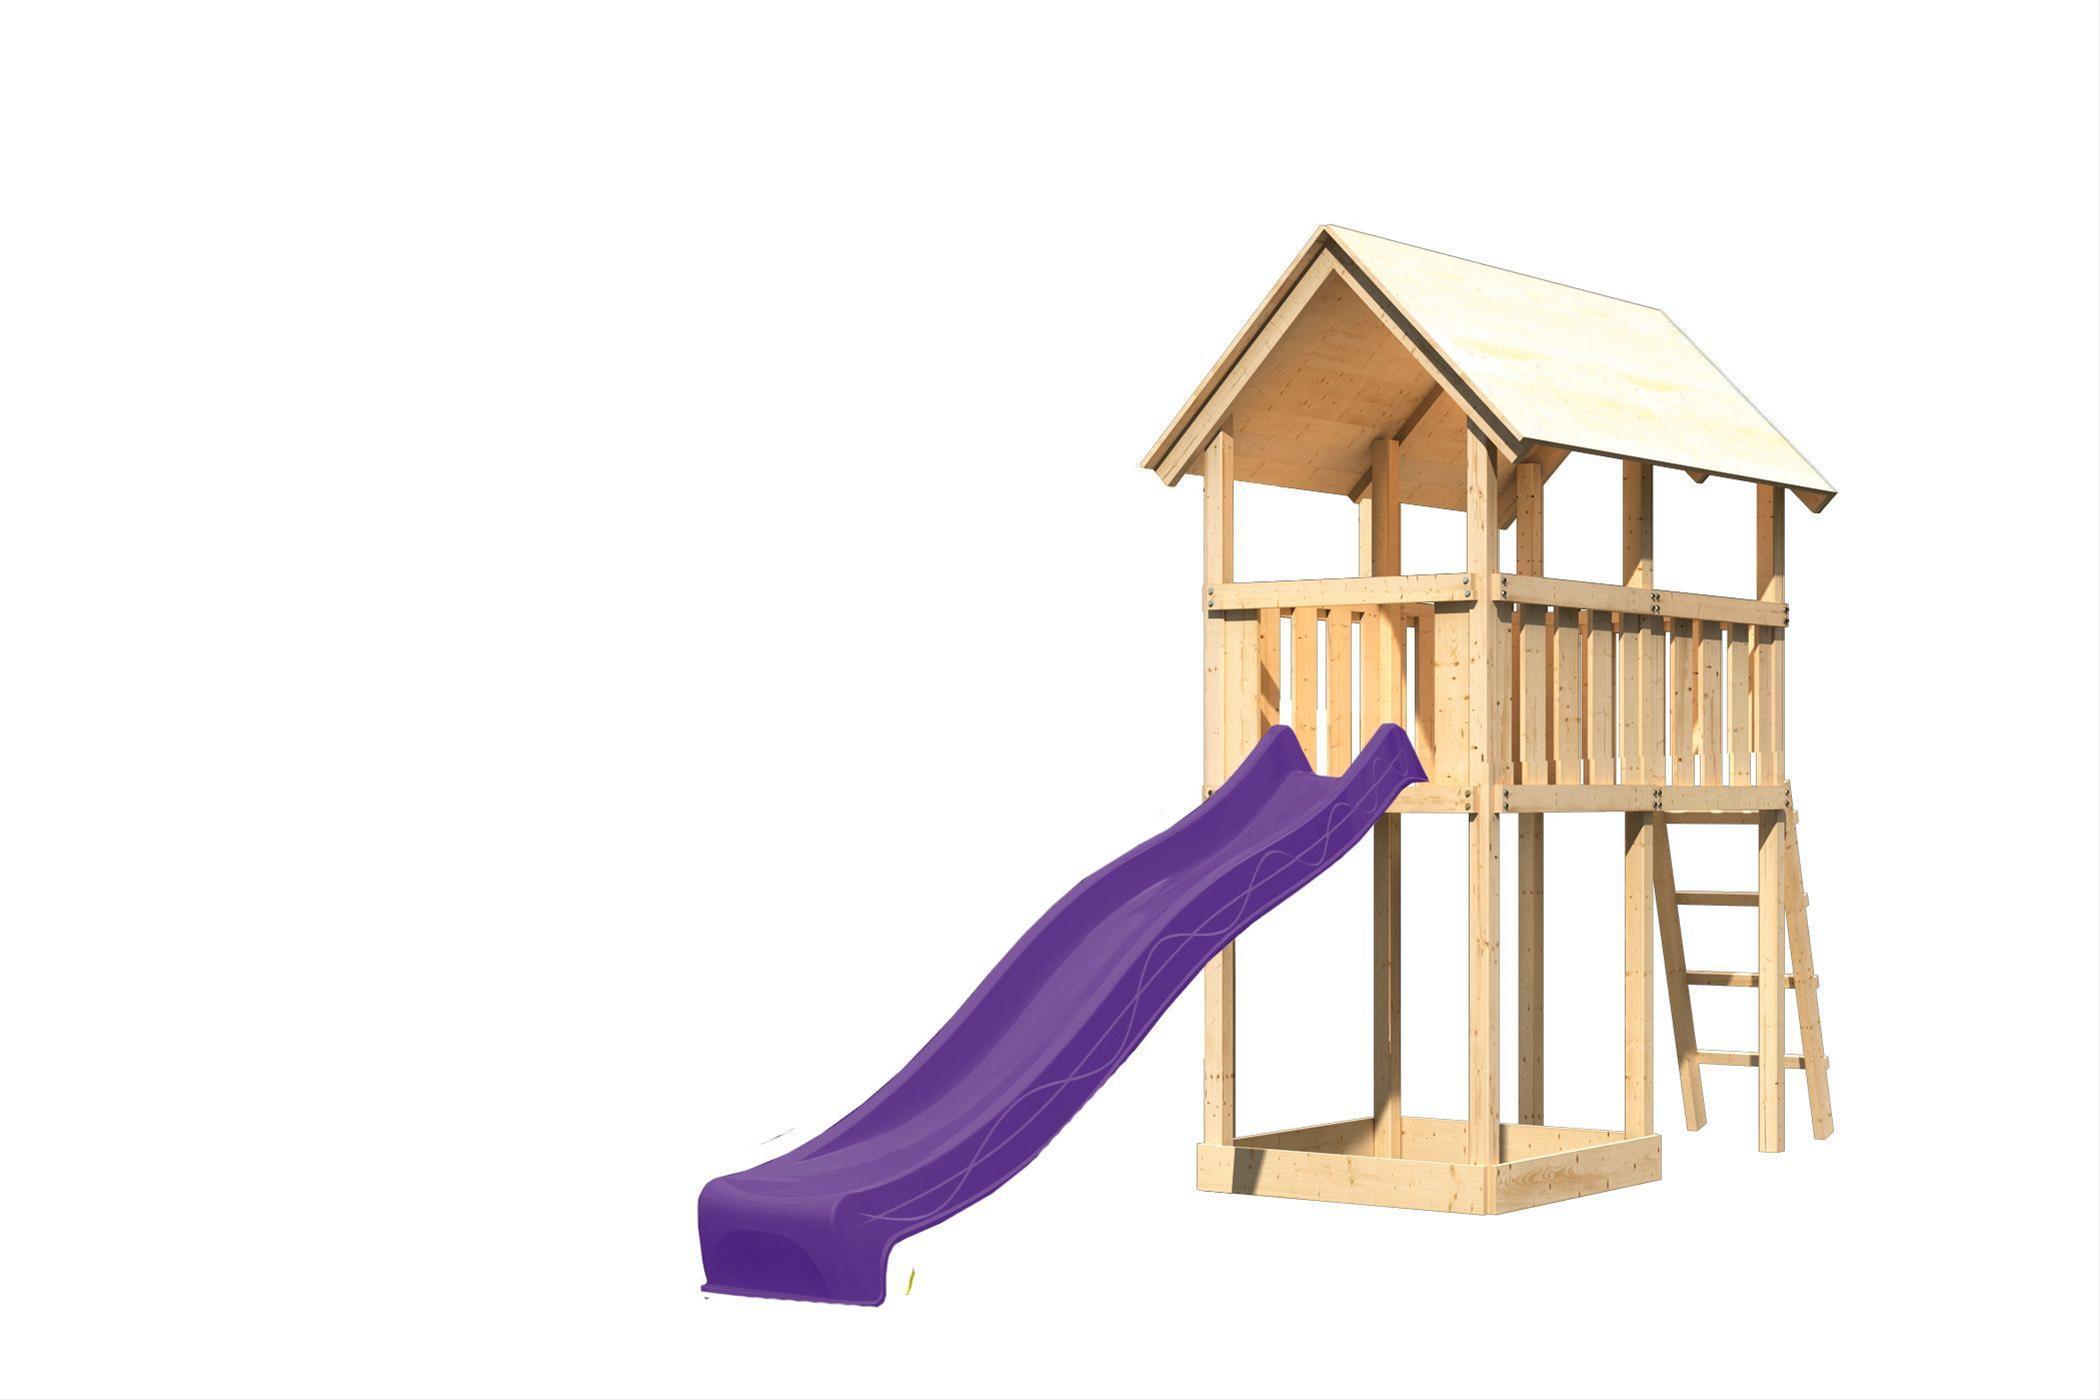 Spielturm / Kletterturm Karibu Akubi Danny SetA Rutsche lila 137x209cm Bild 2